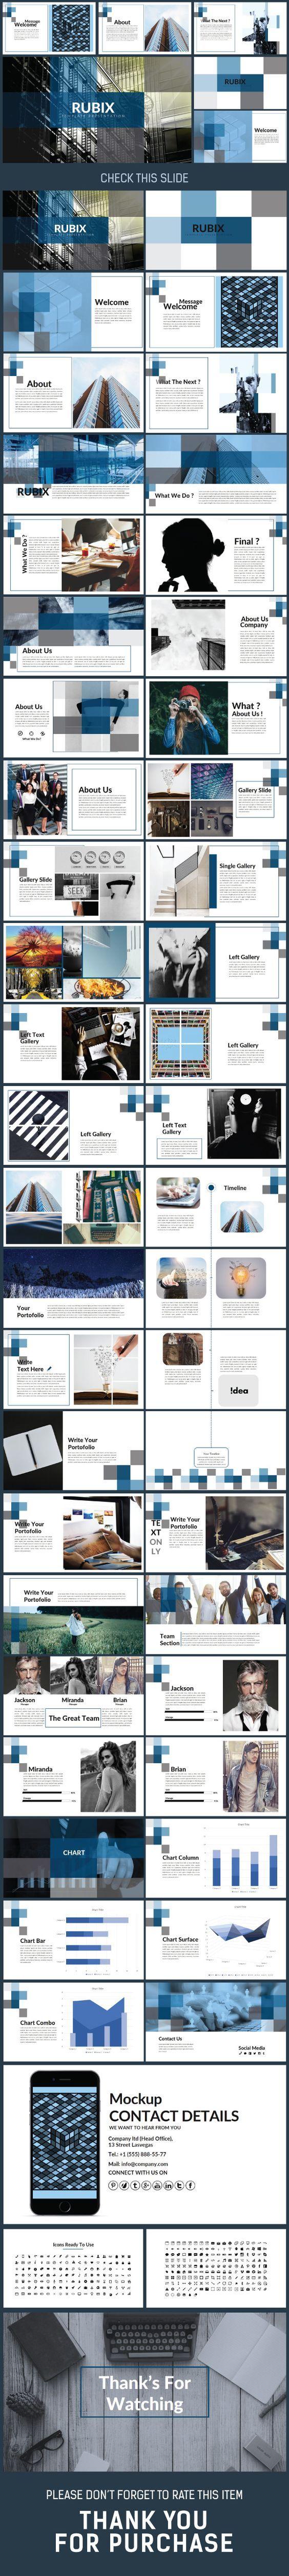 RUBIX - Presentation PowerPoint Template: